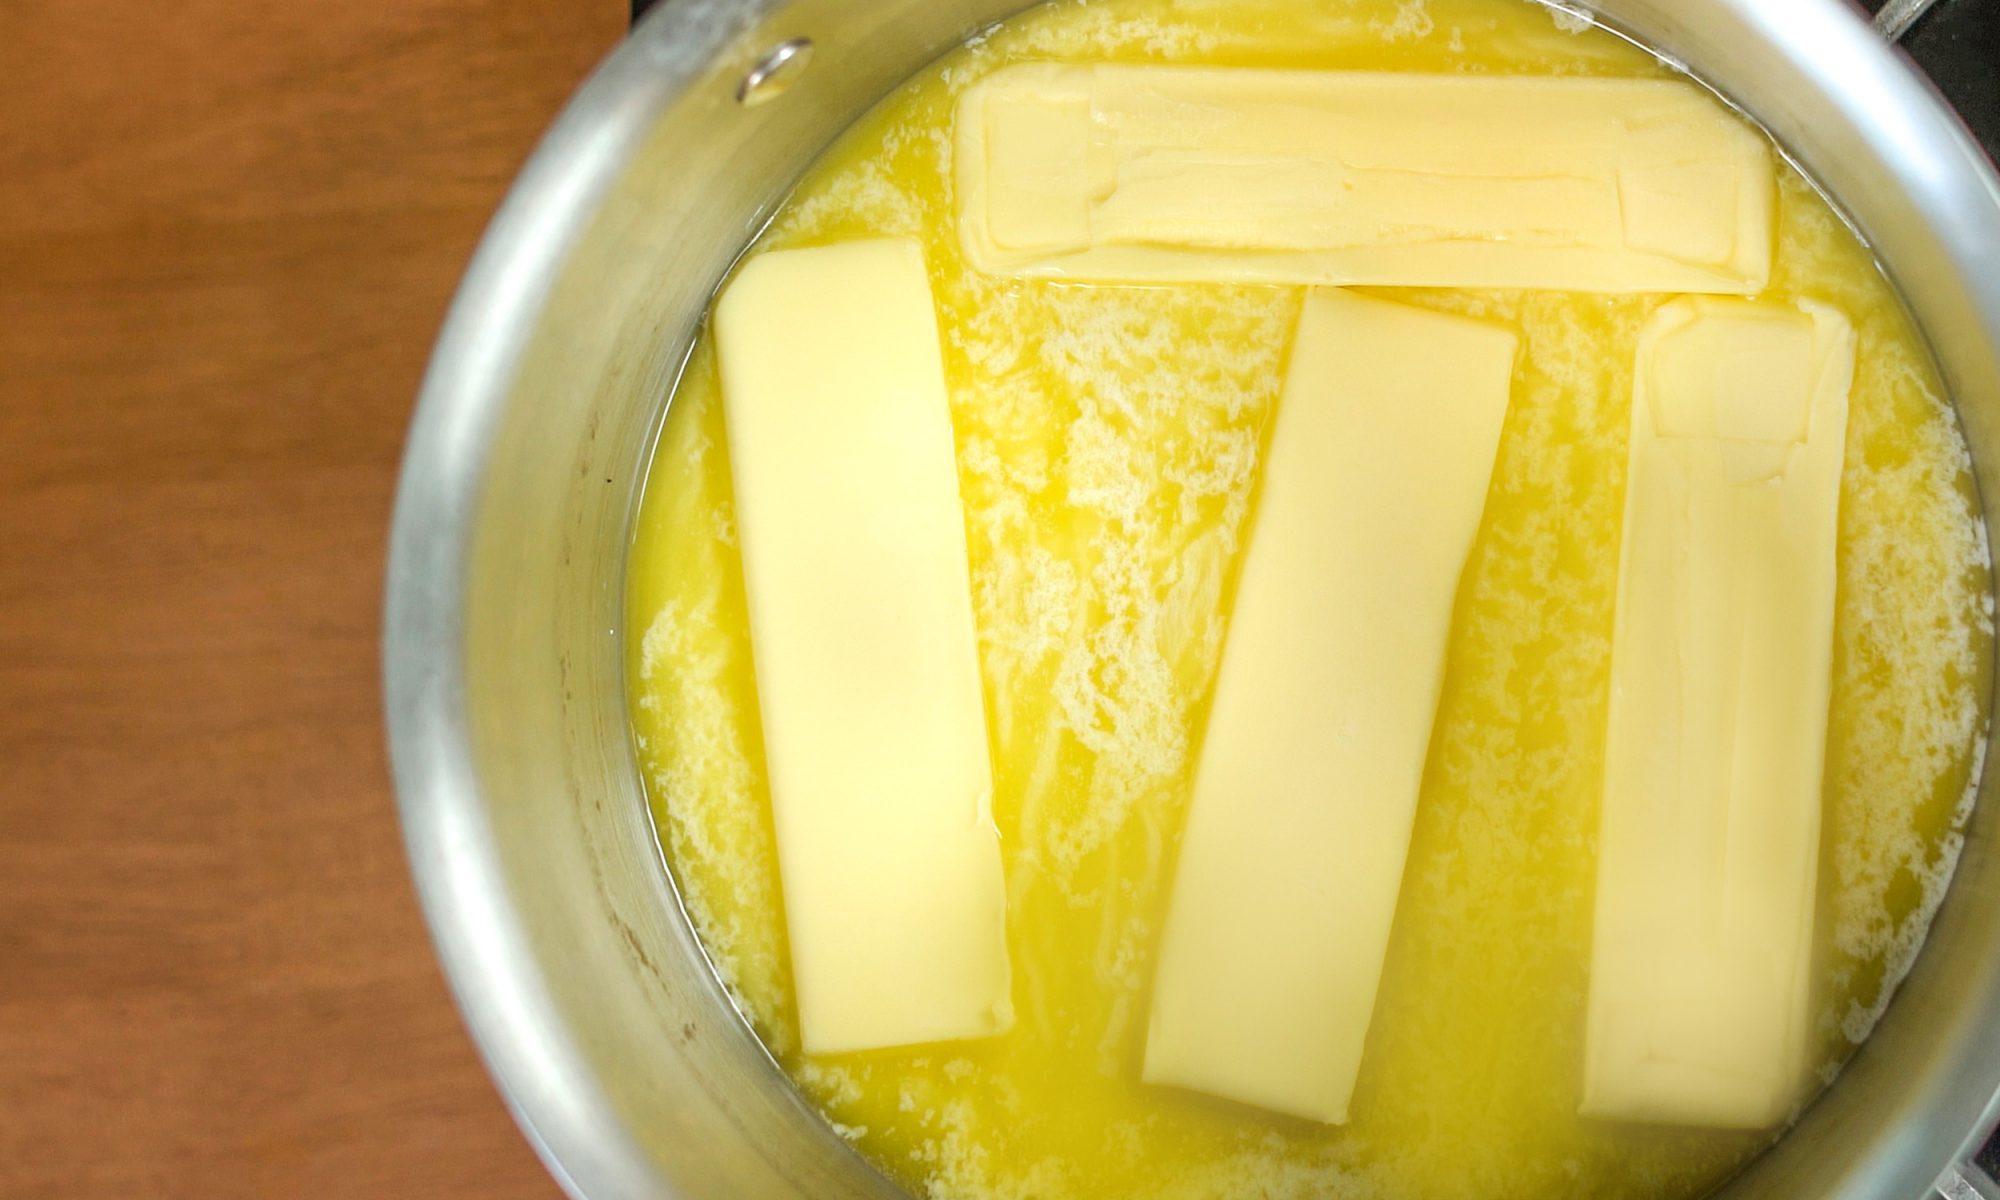 EC: Making Clarified Butter Isn't as Complicated as It Sounds